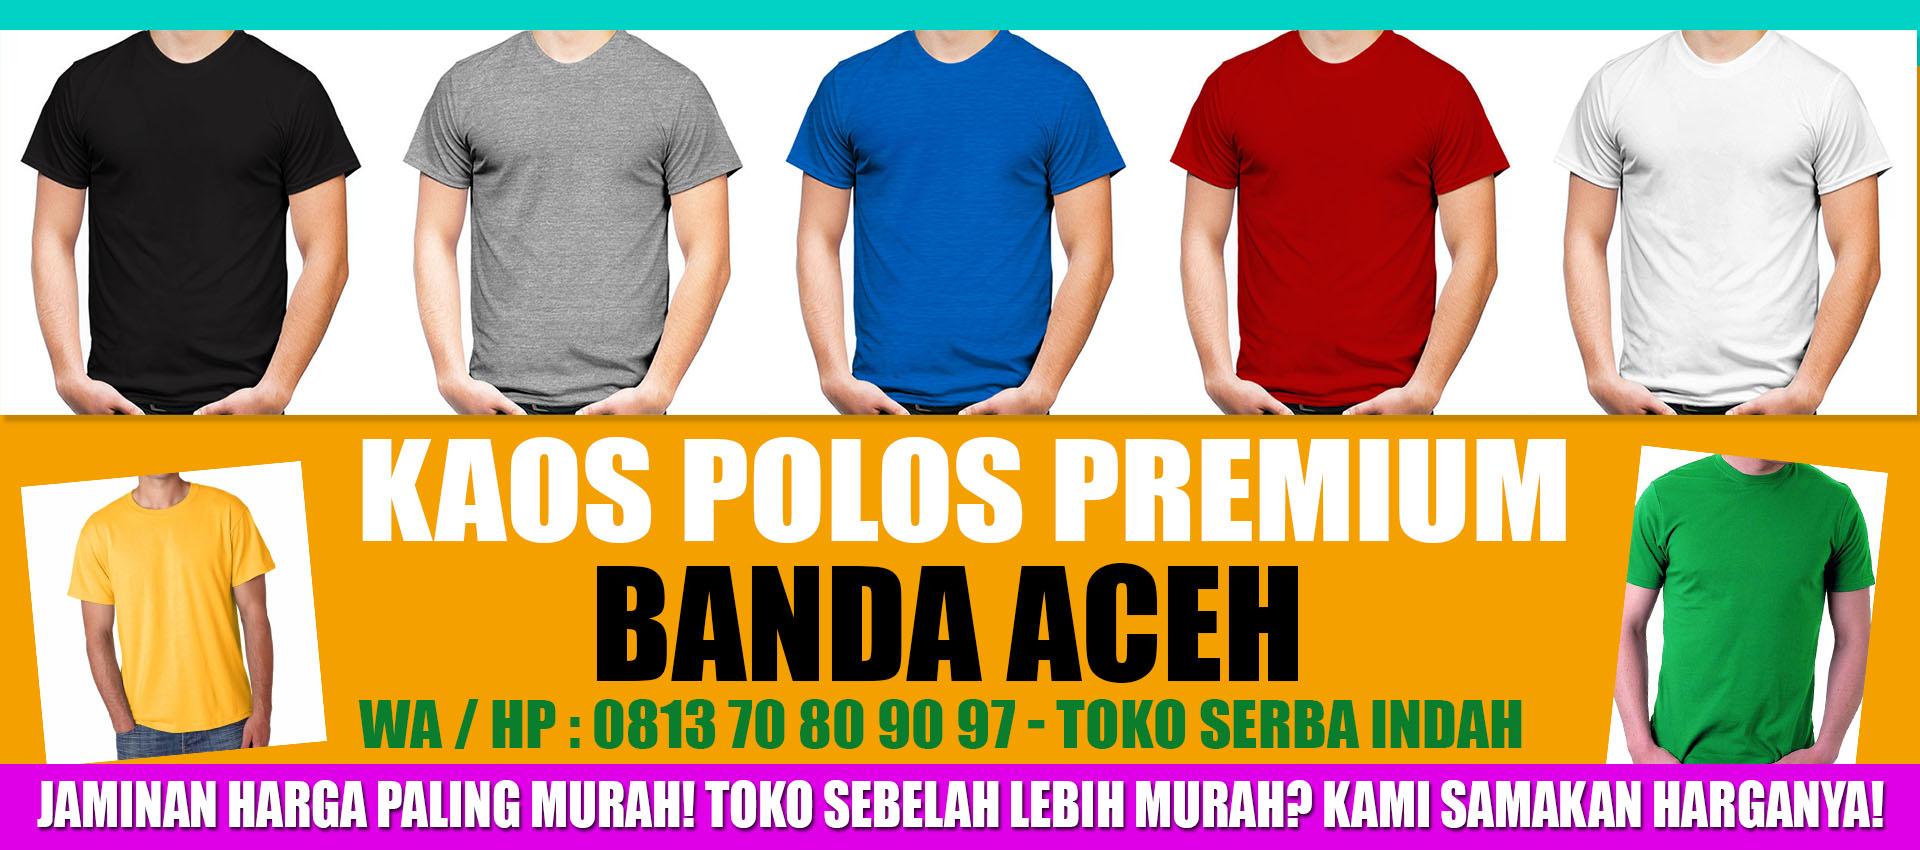 Jual Kaos Polos Premium Grosir Dan Eceran Cv Serba Indah Banda Aceh 100 Persen Real Cotton Combed